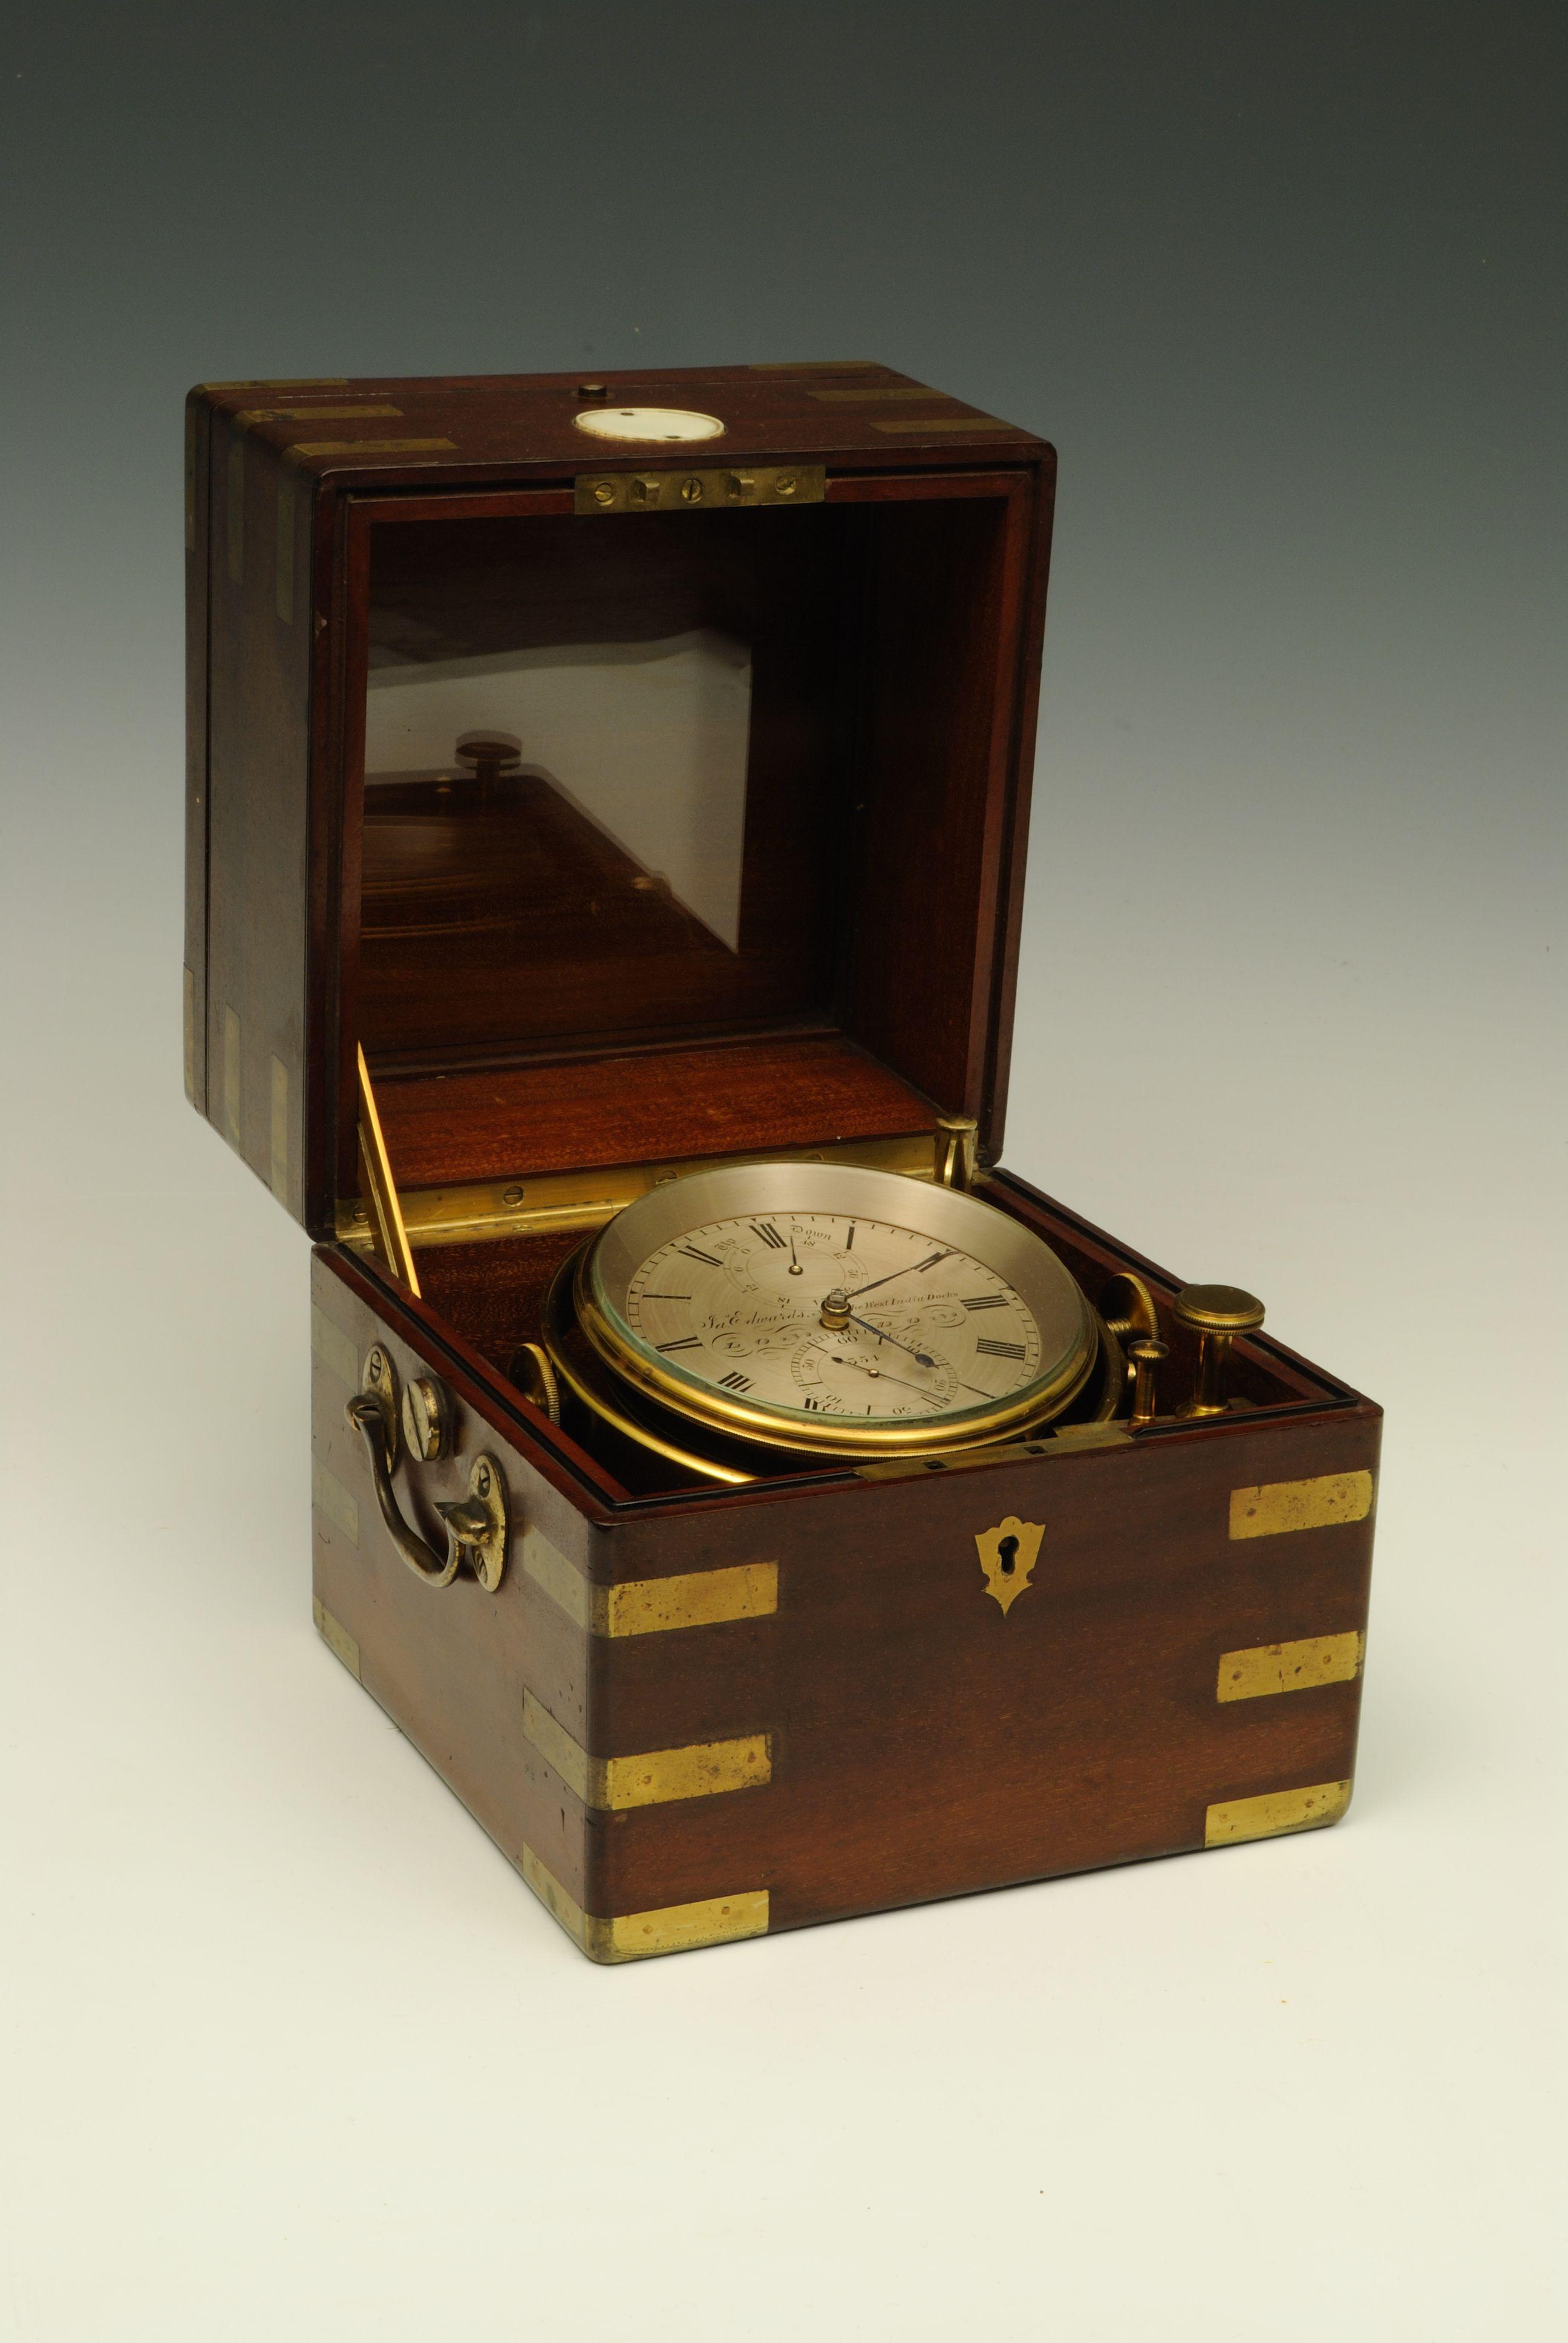 023f584ccbb A fine 19c ships chronometer Itens Masculinos